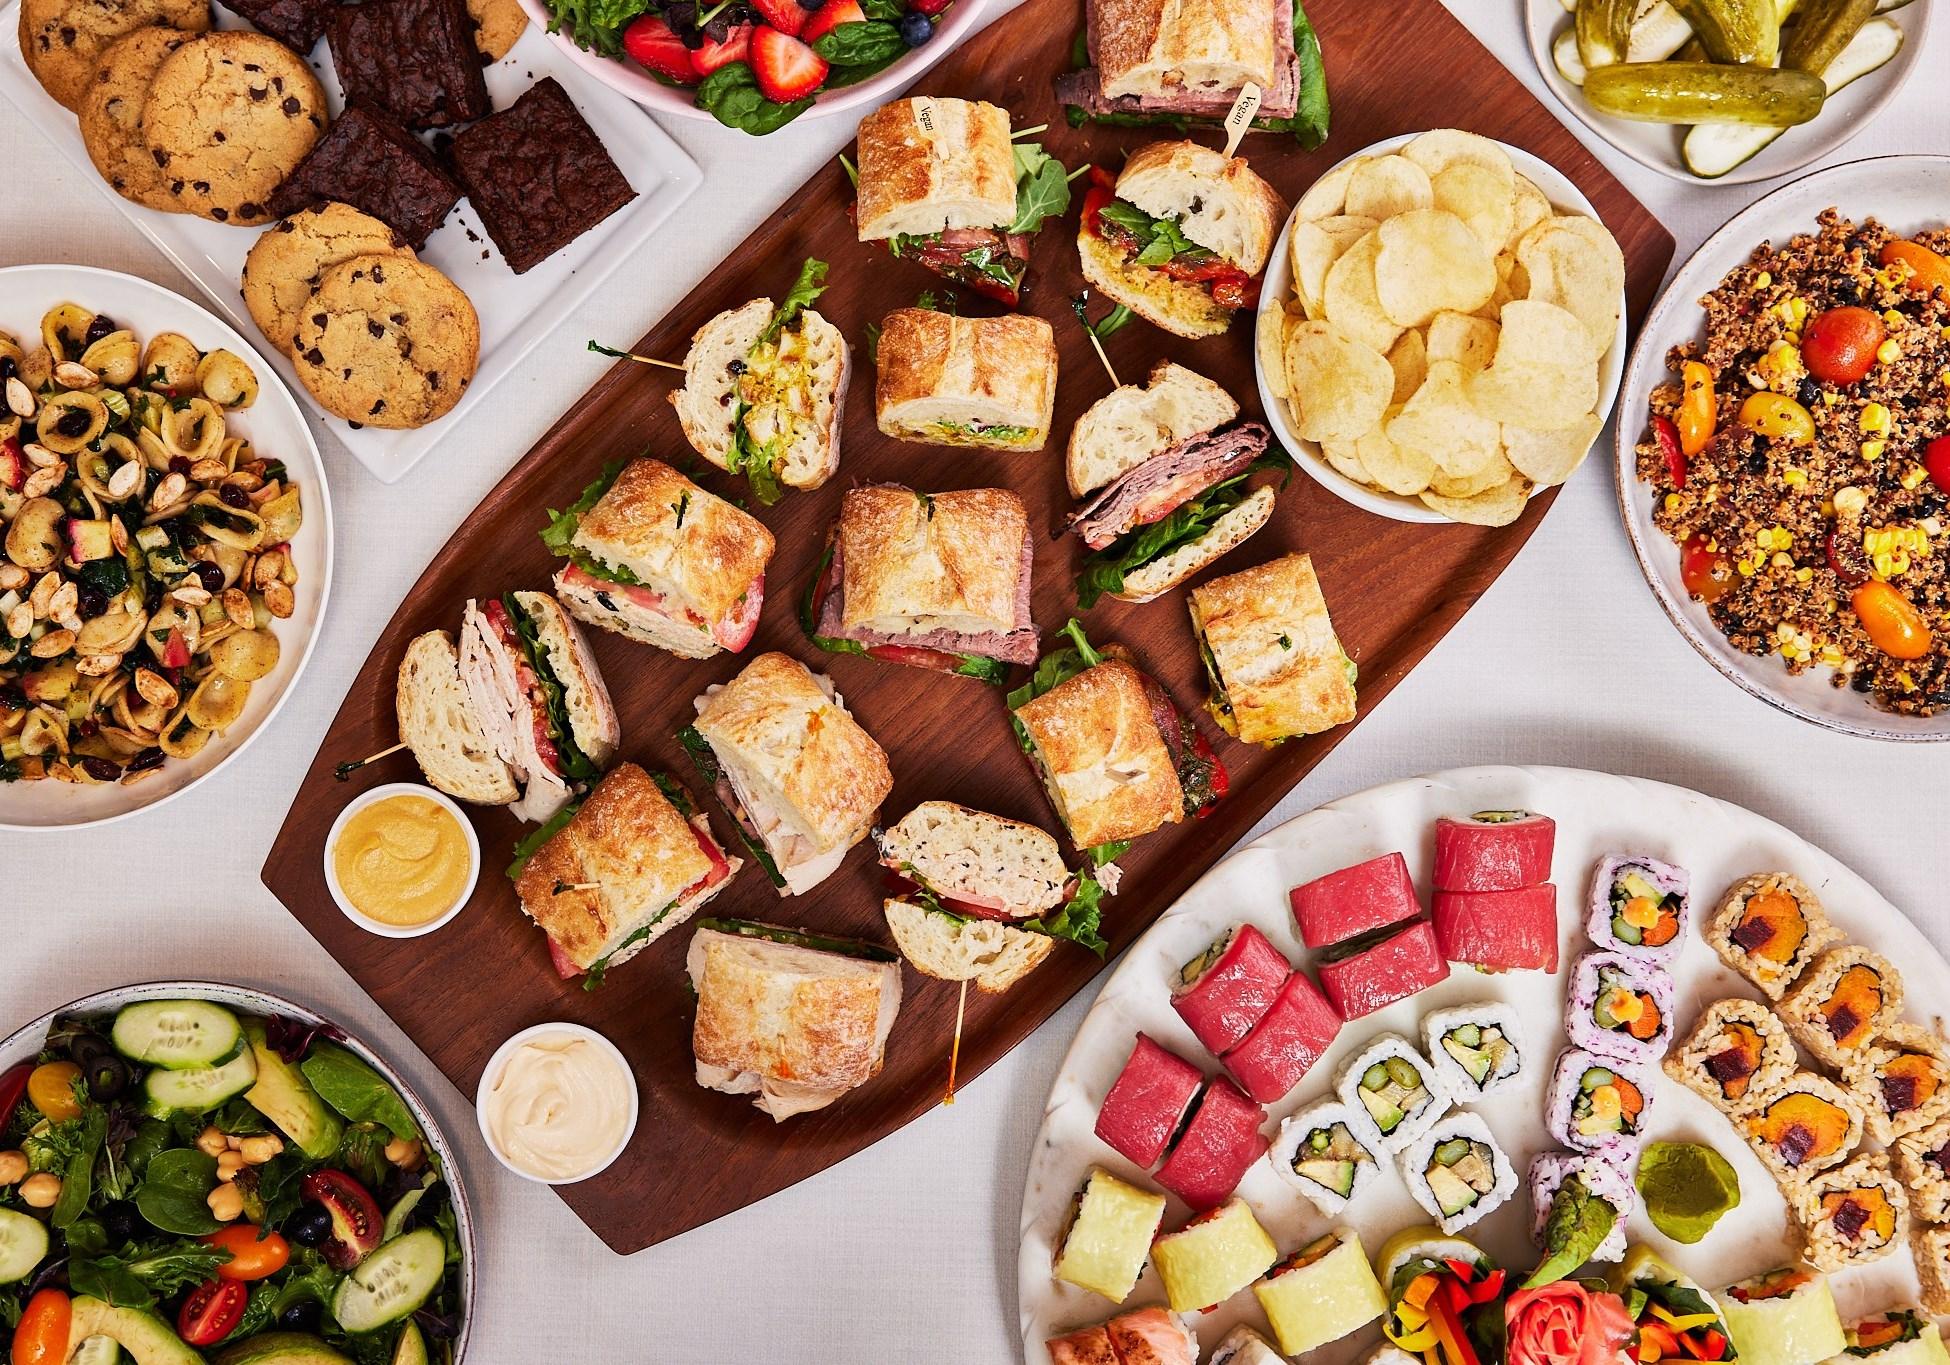 Boston Common Sushi & Sandwich Package - Vegetarian & Fish Large